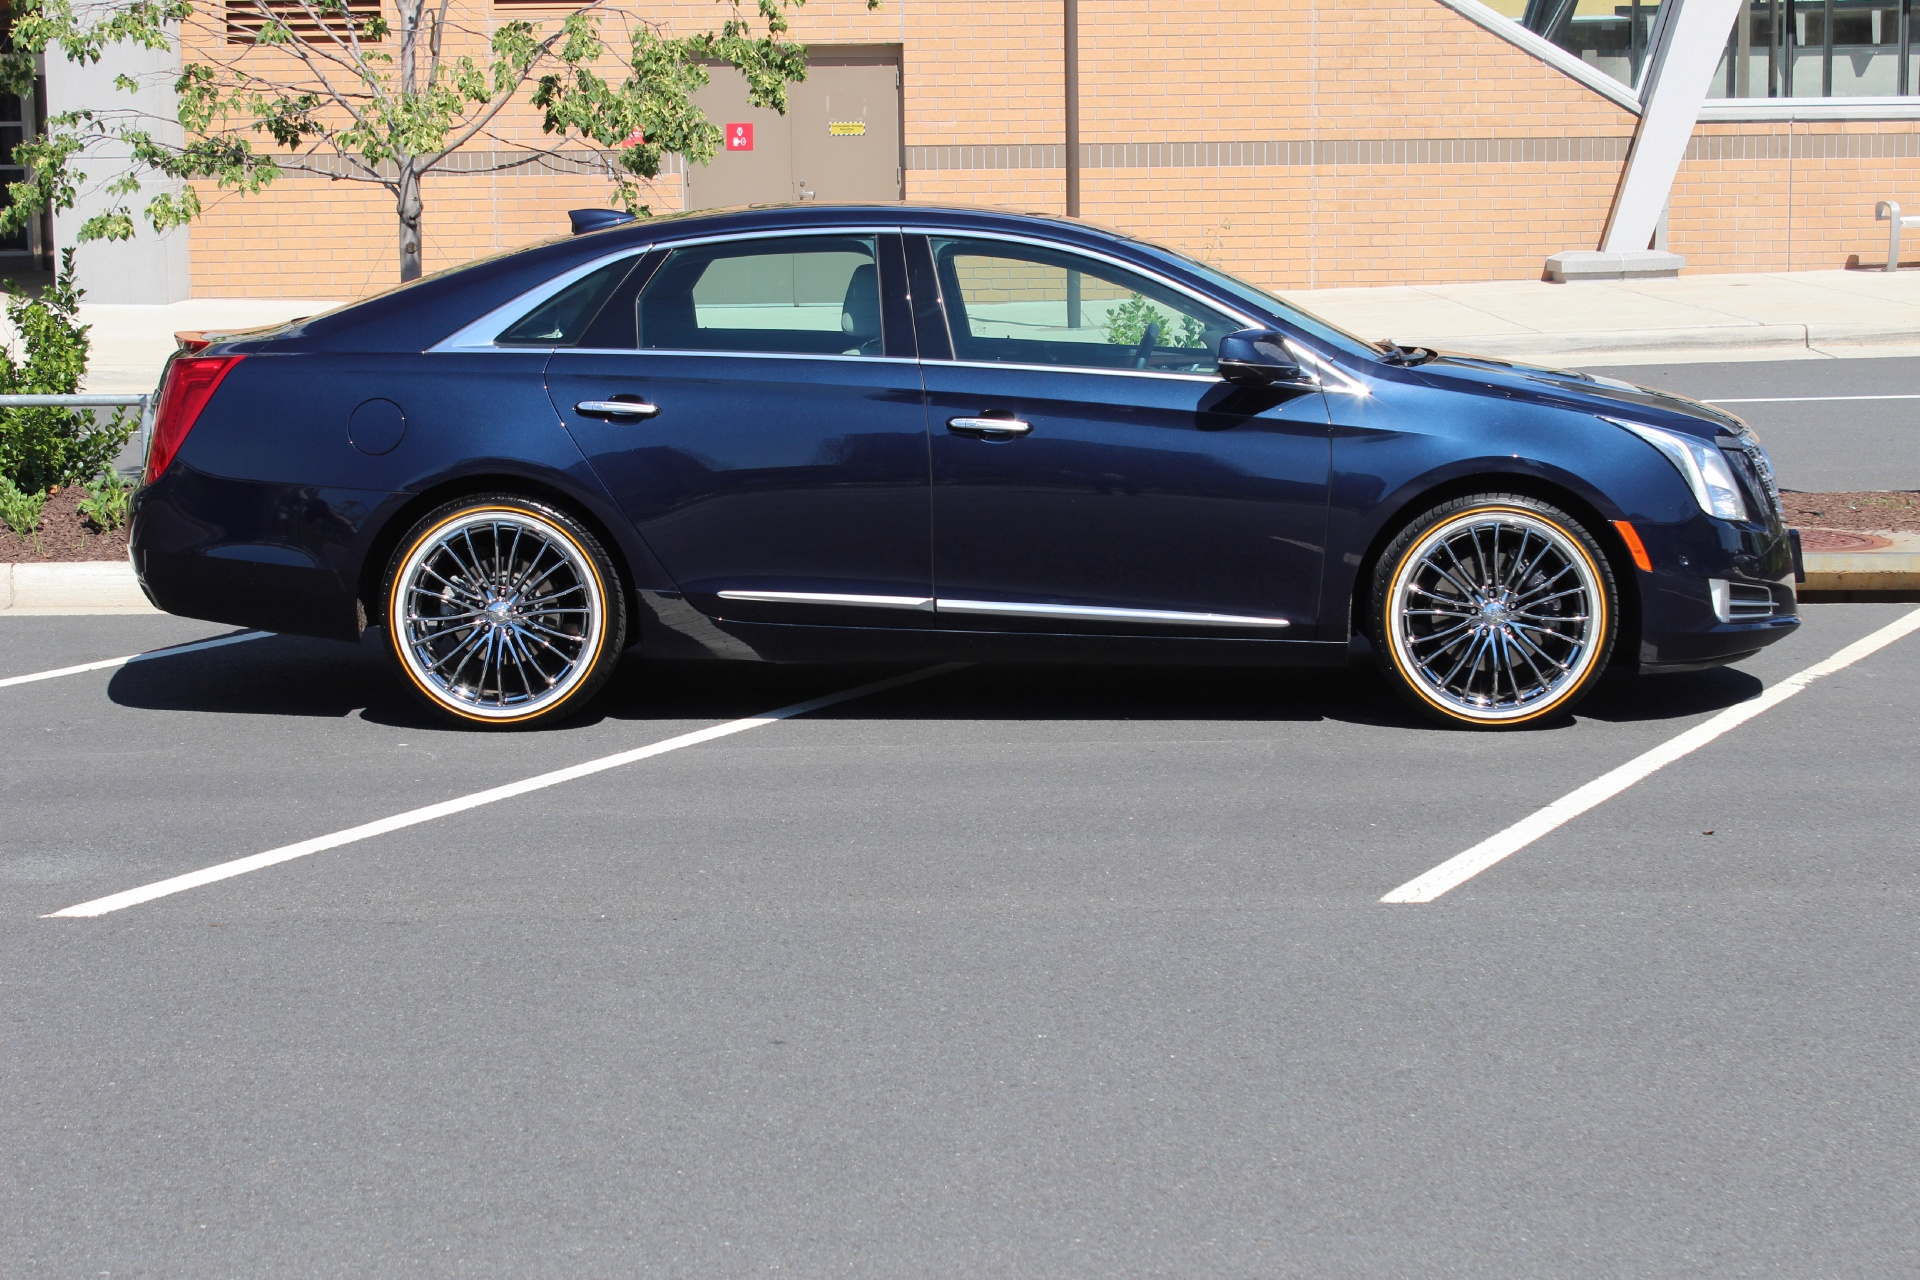 sale cadillac size xts full sedan houston in tx luxury sedans for